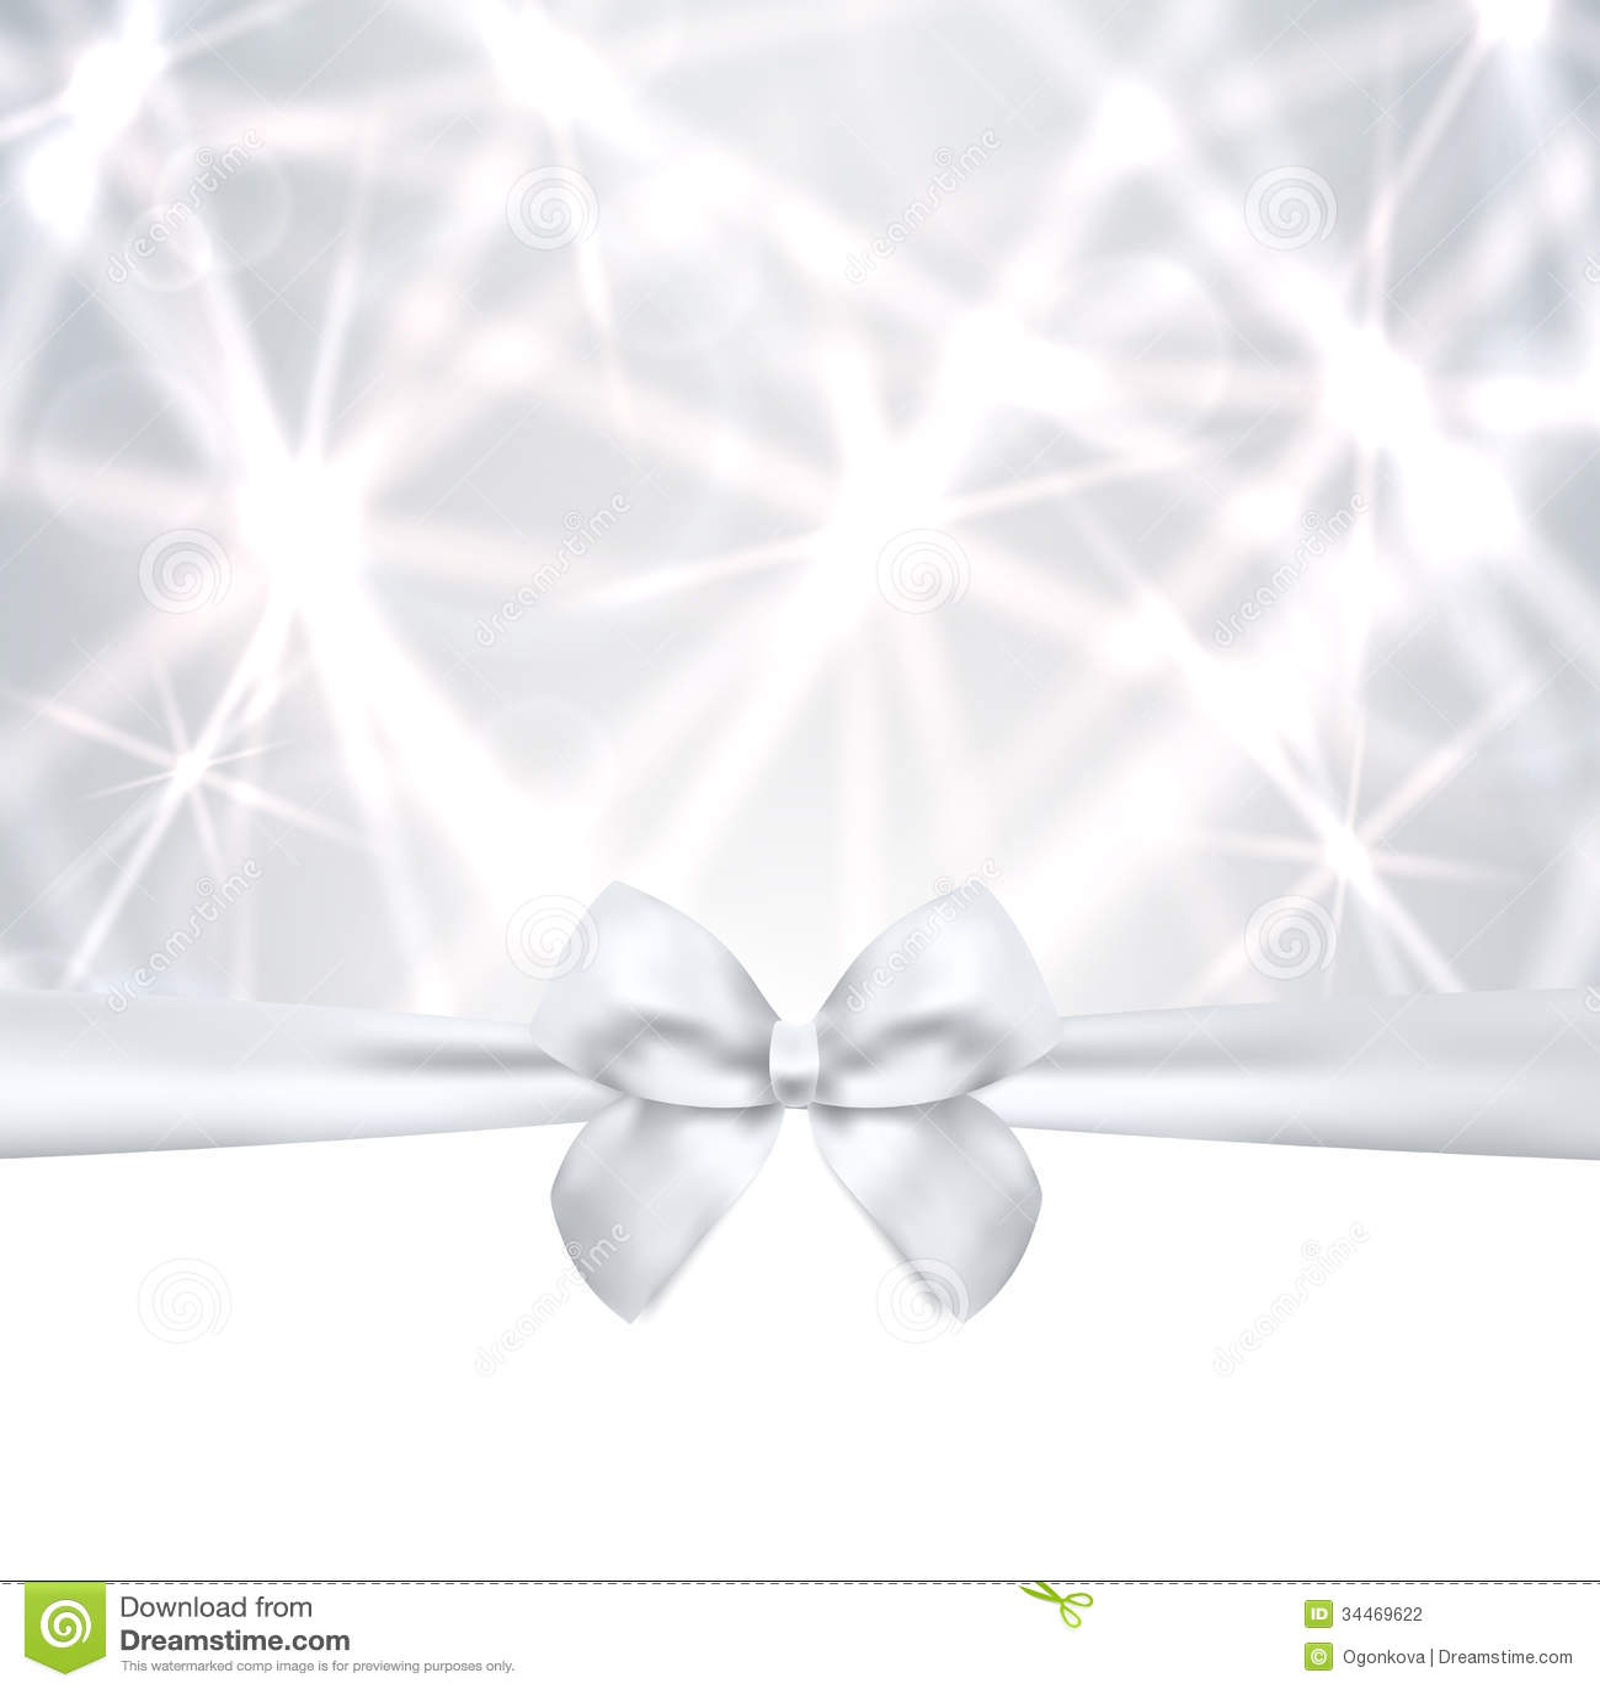 holiday card christmas gift birthday card bow royalty holiday card christmas gift birthday card silv stock photography